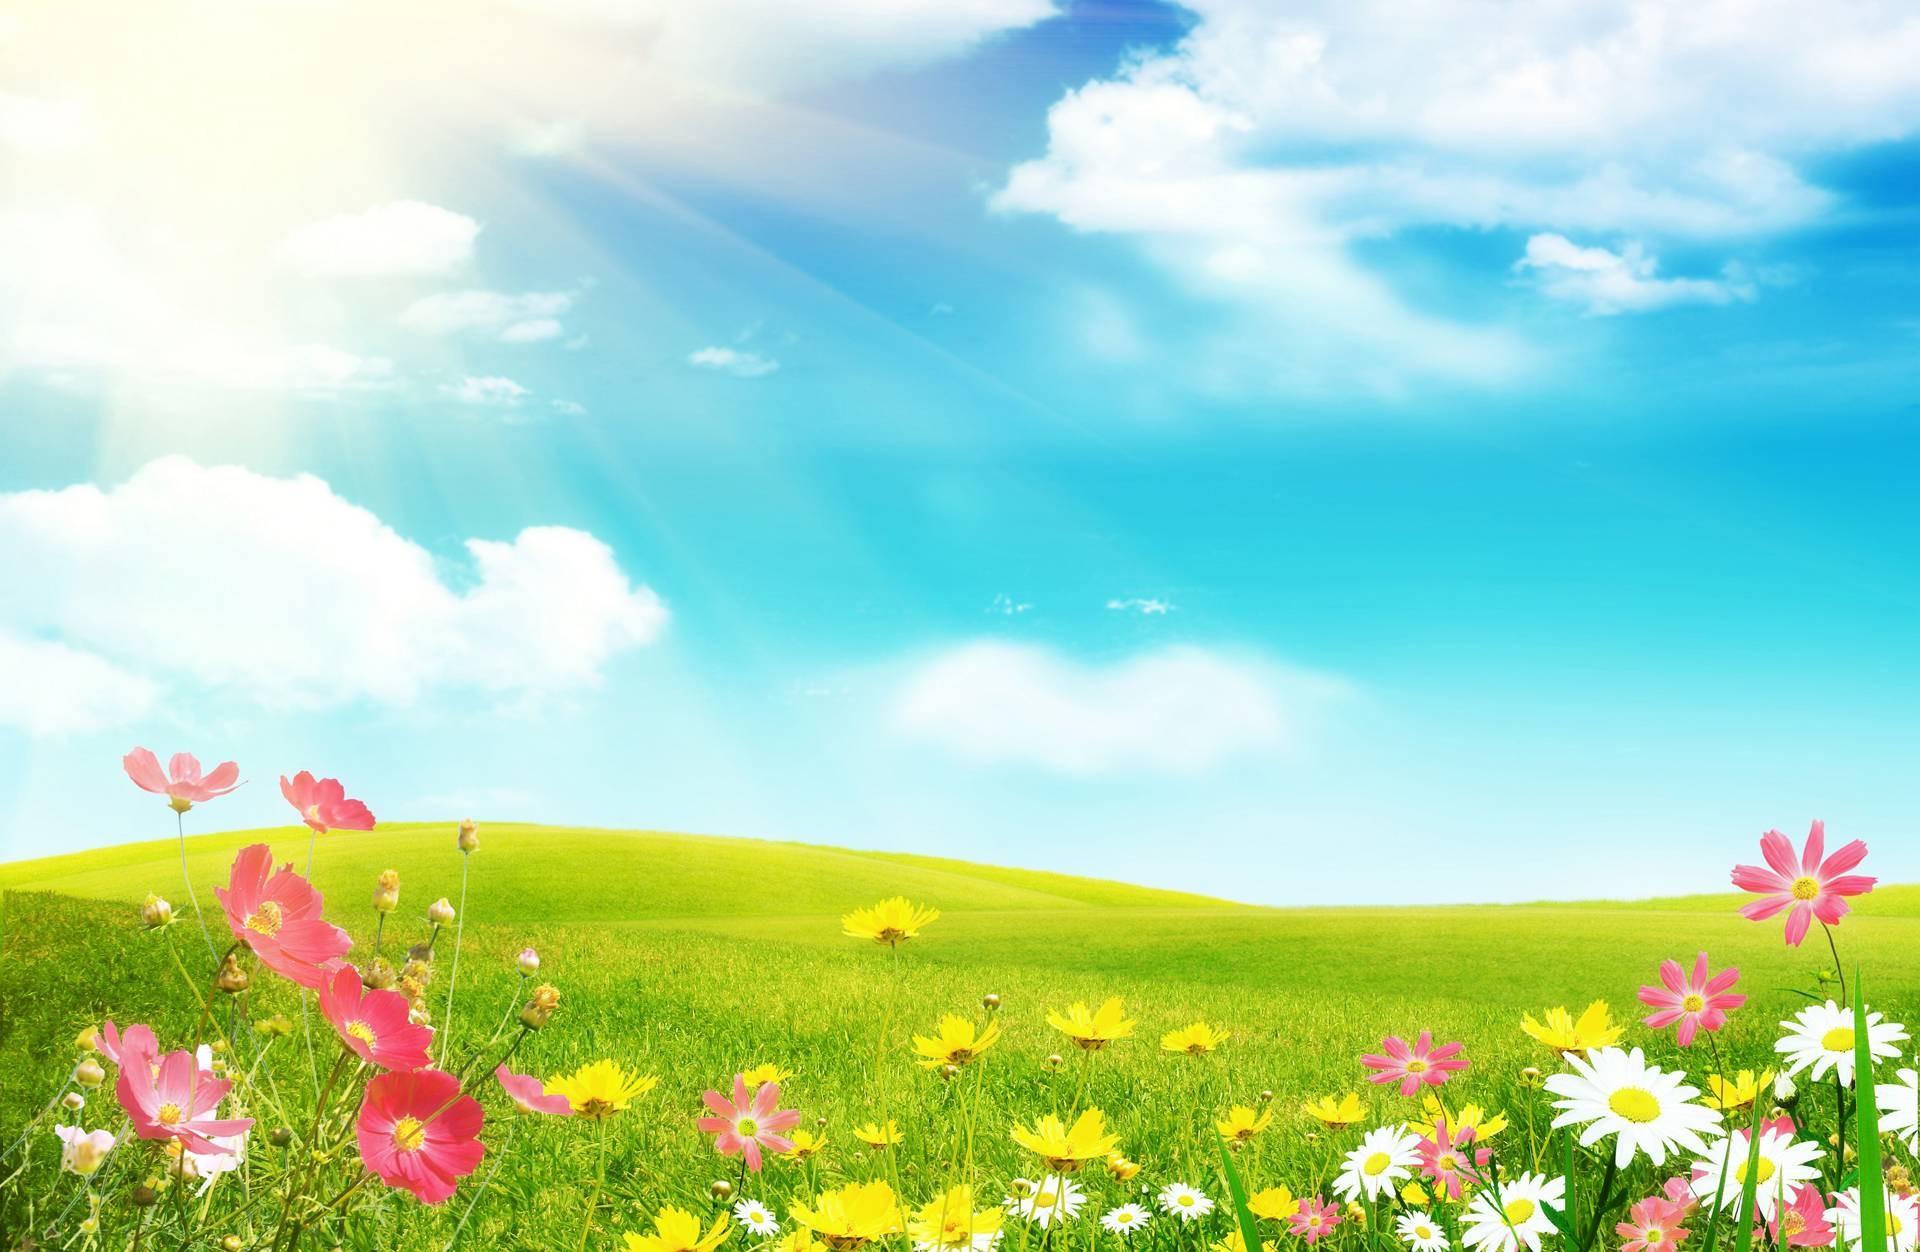 springtime wallpaper 60 images